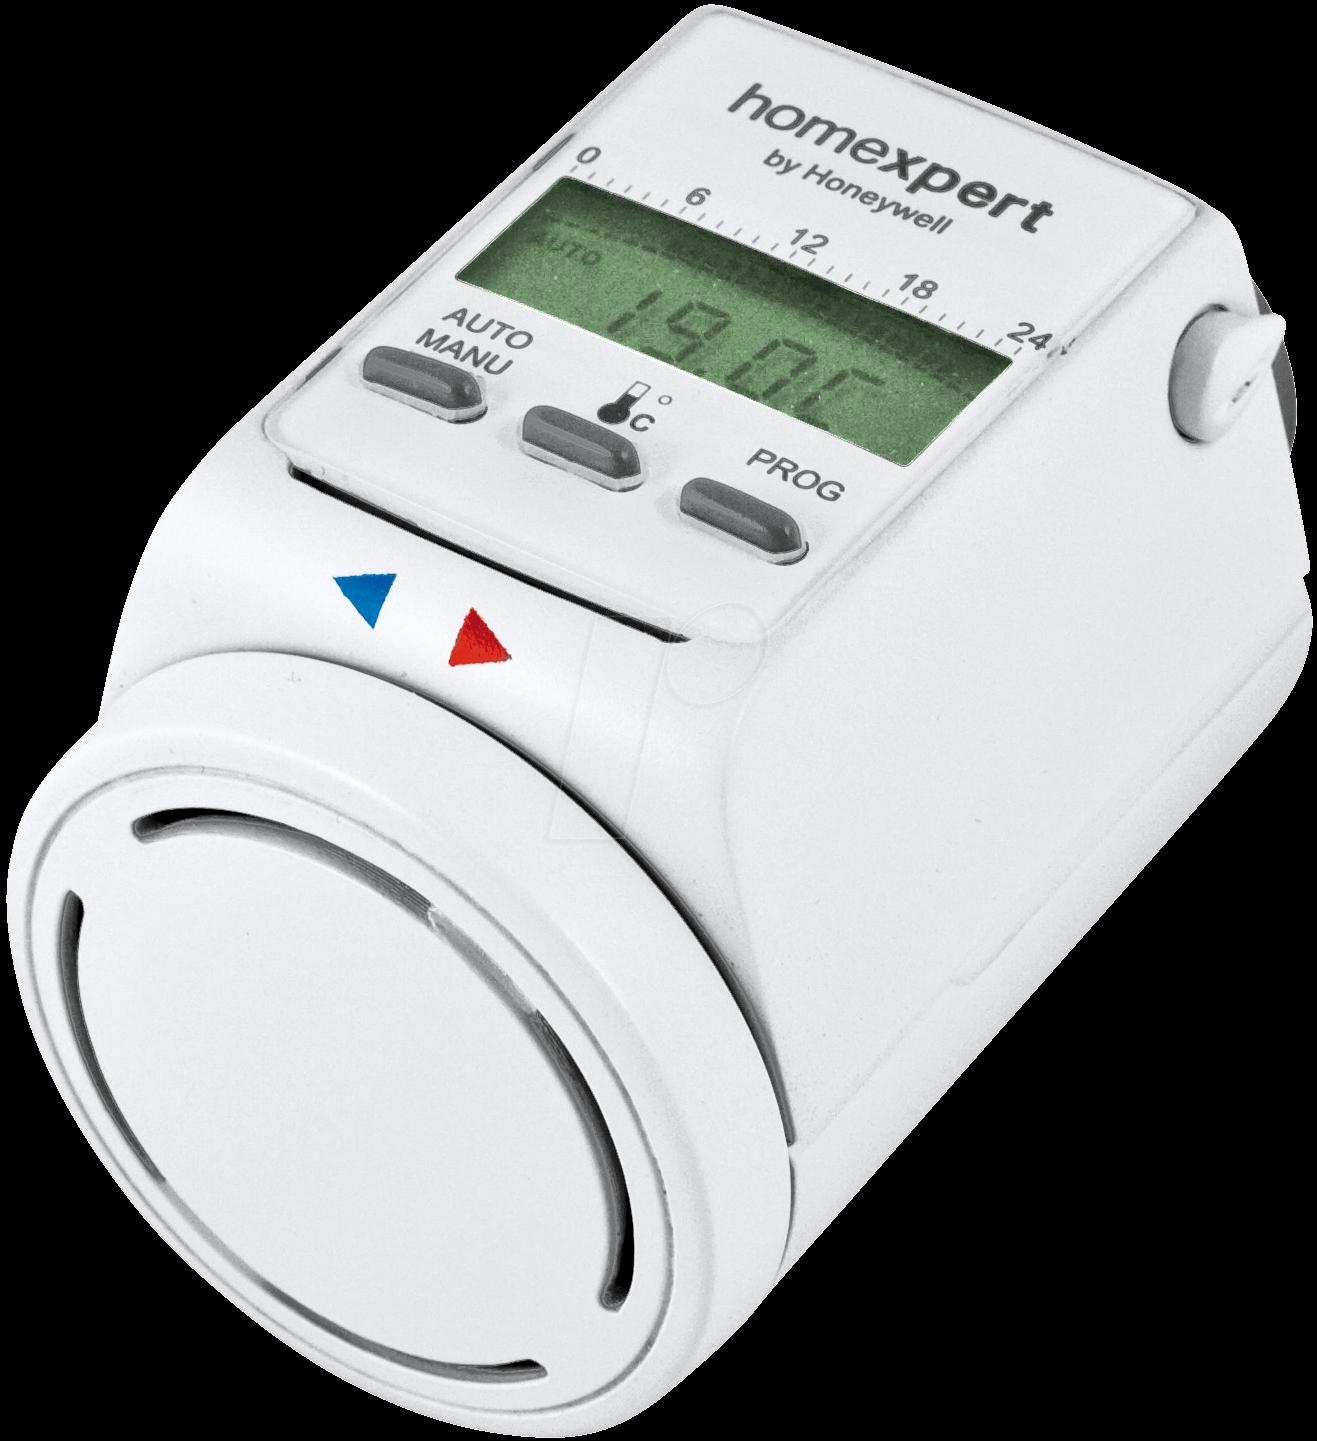 : Homexpert electronic radiator thermostat at reichelt elektronik #0A72B6